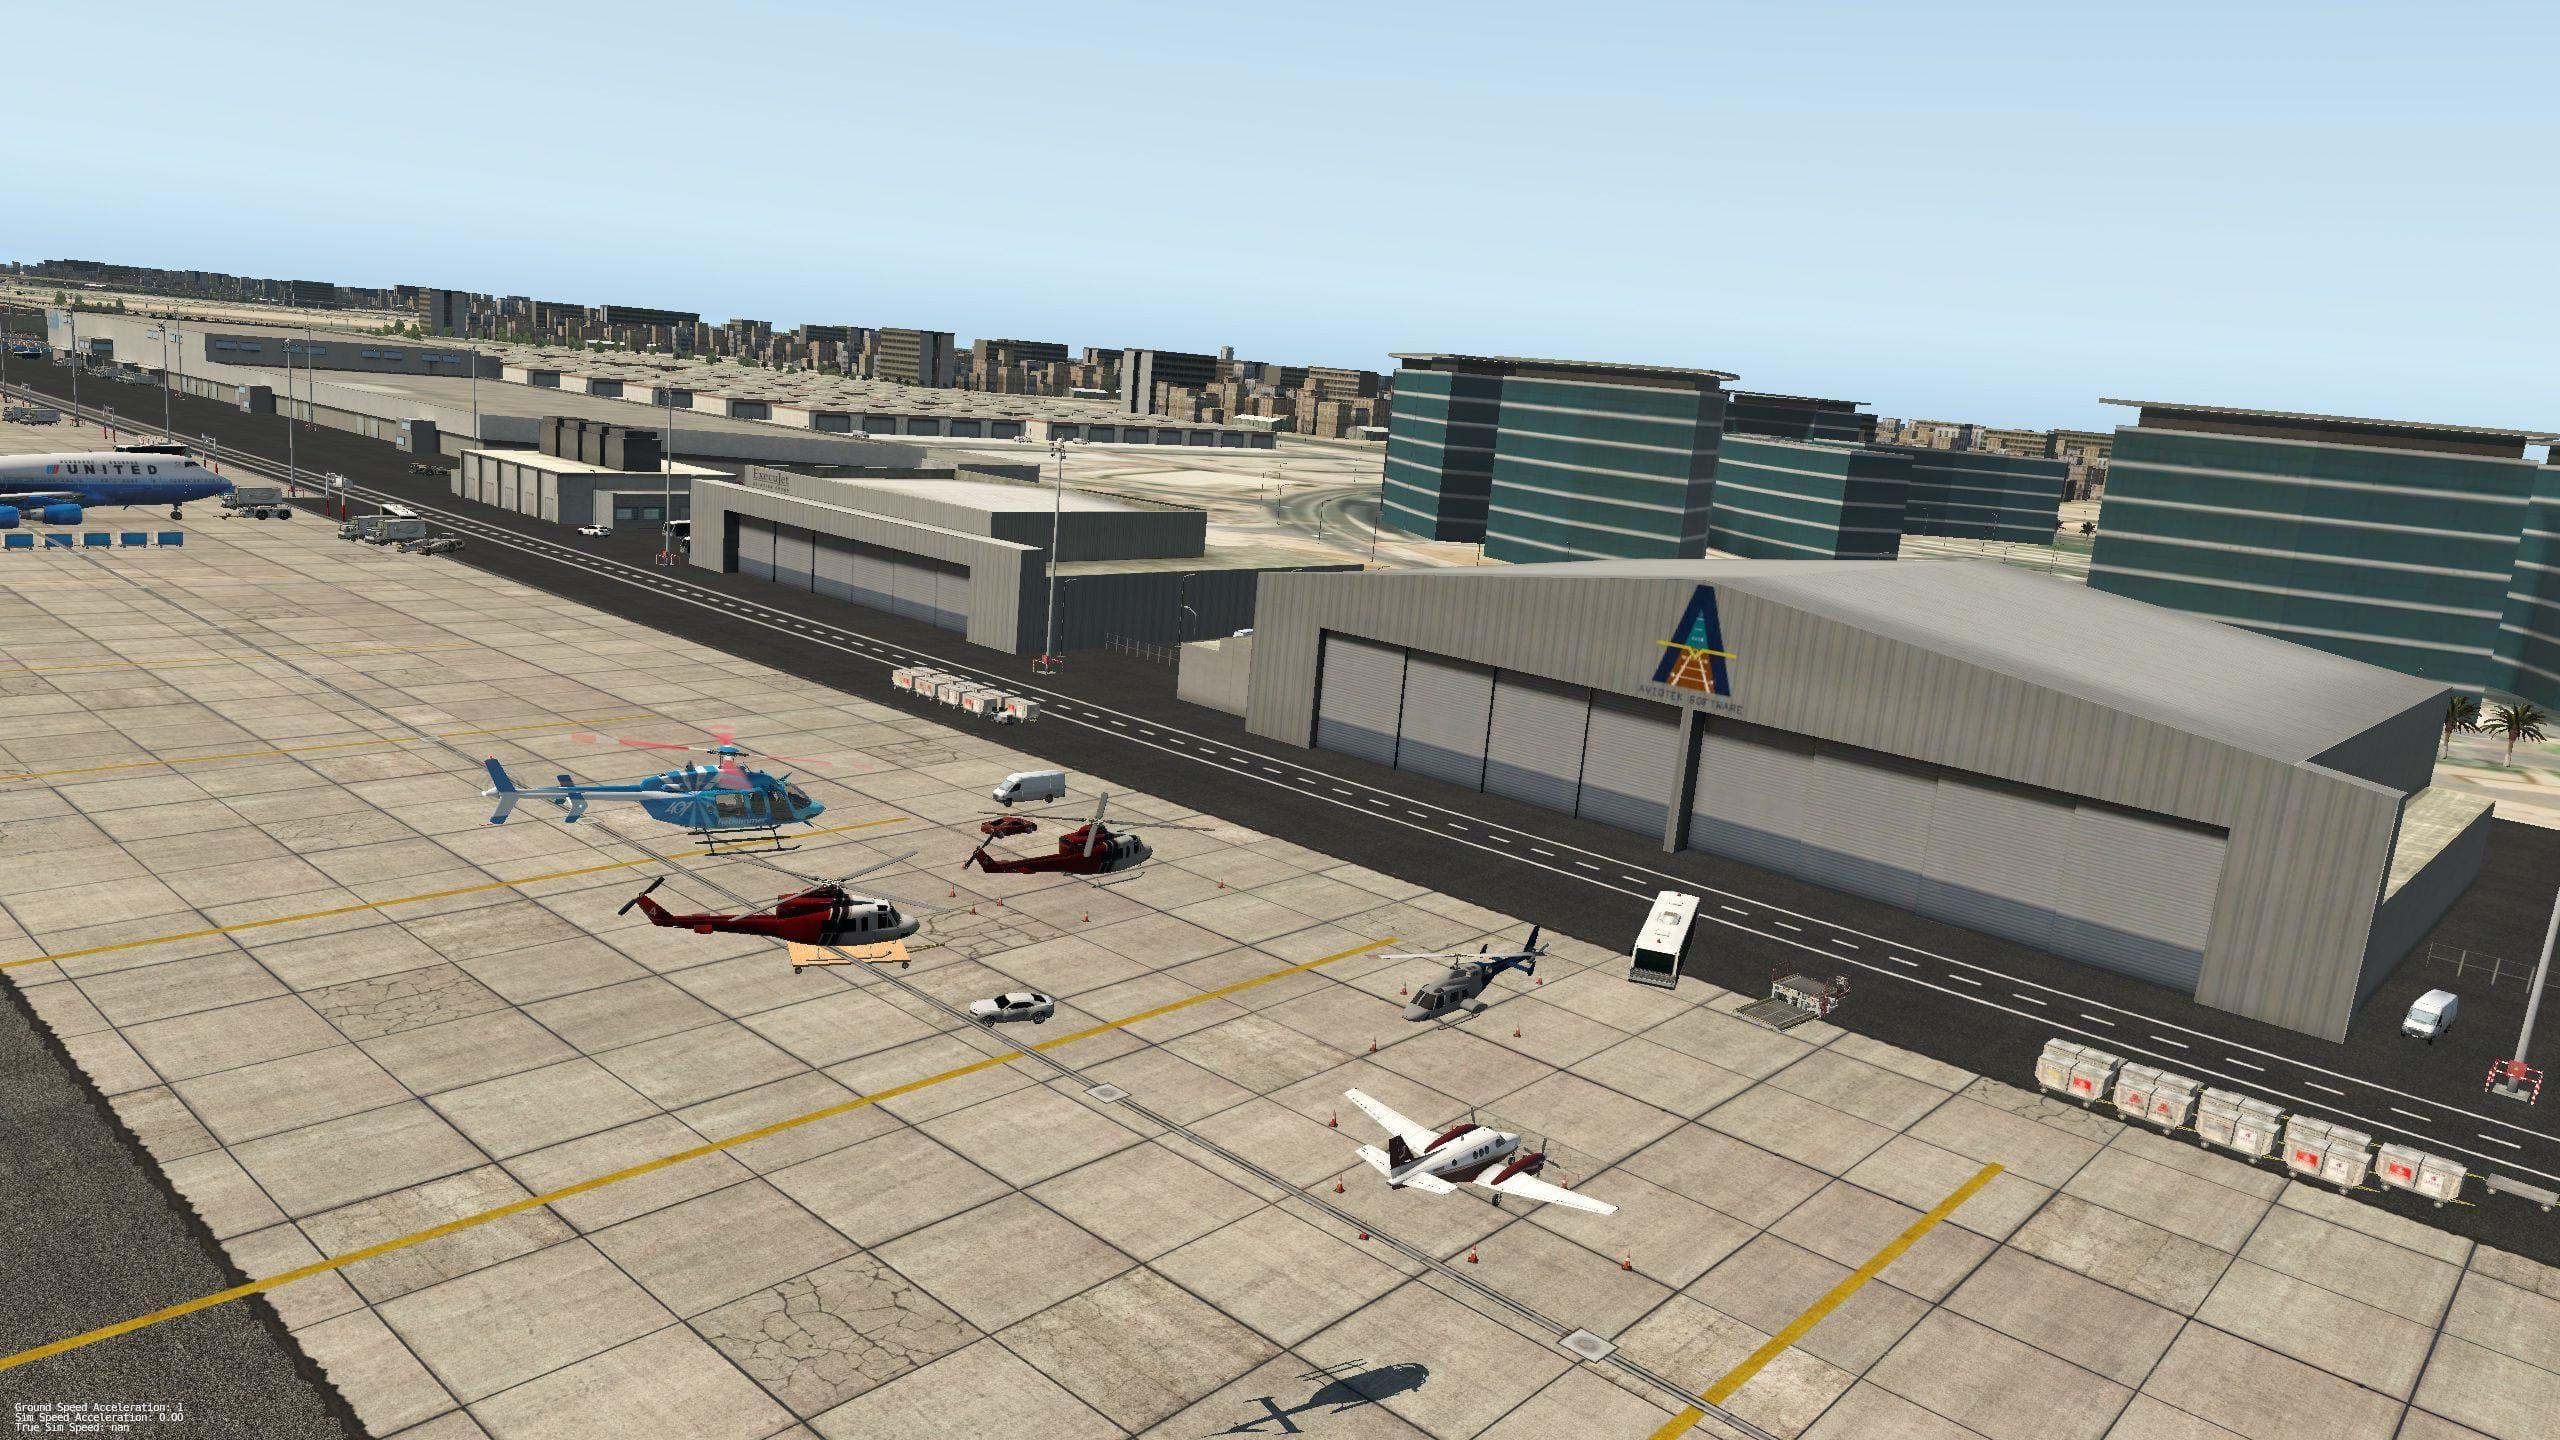 Simmering Airport